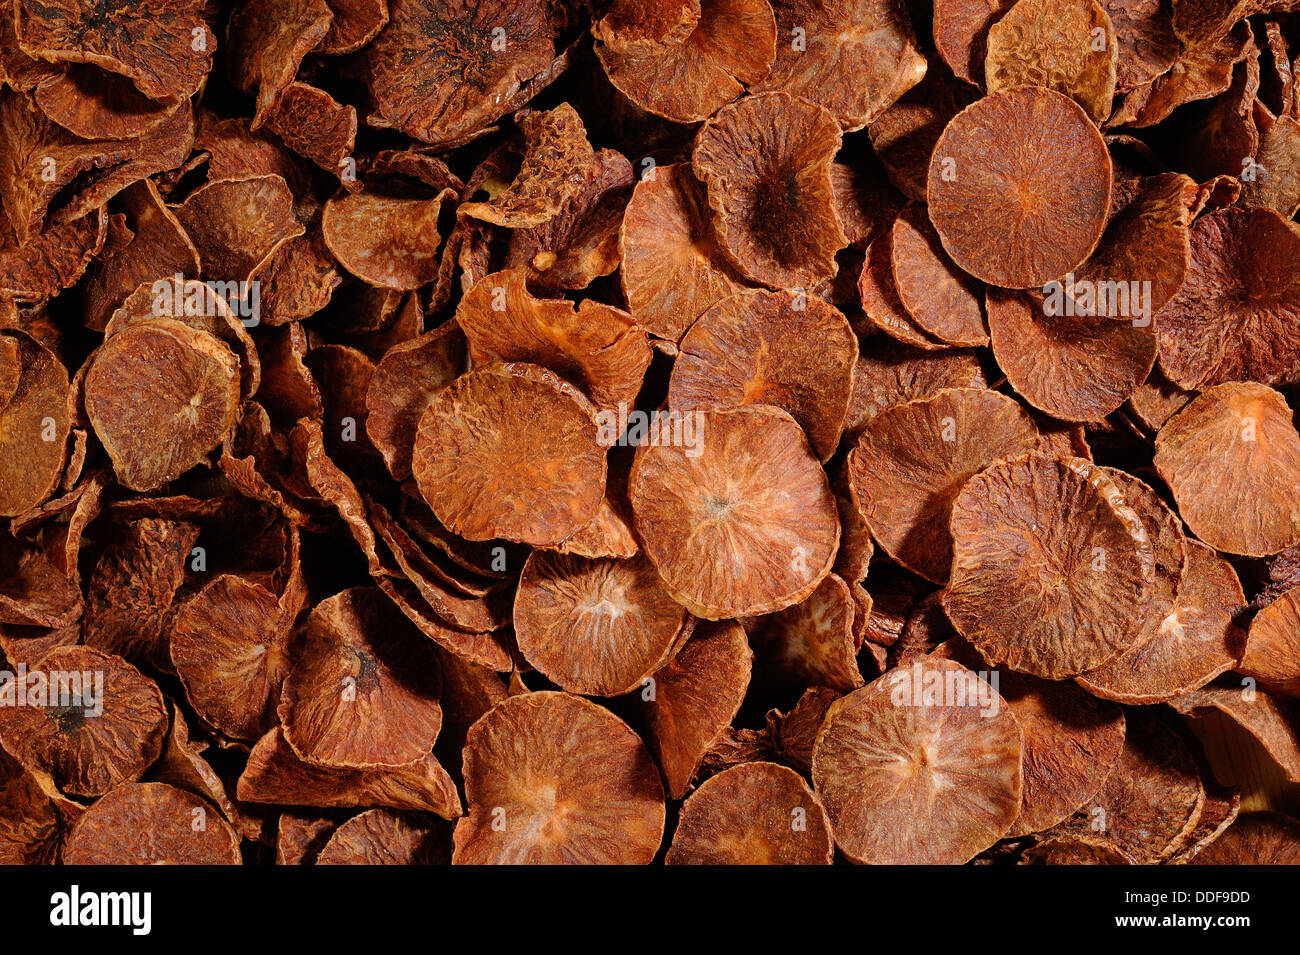 dried betel nut background - Stock Image